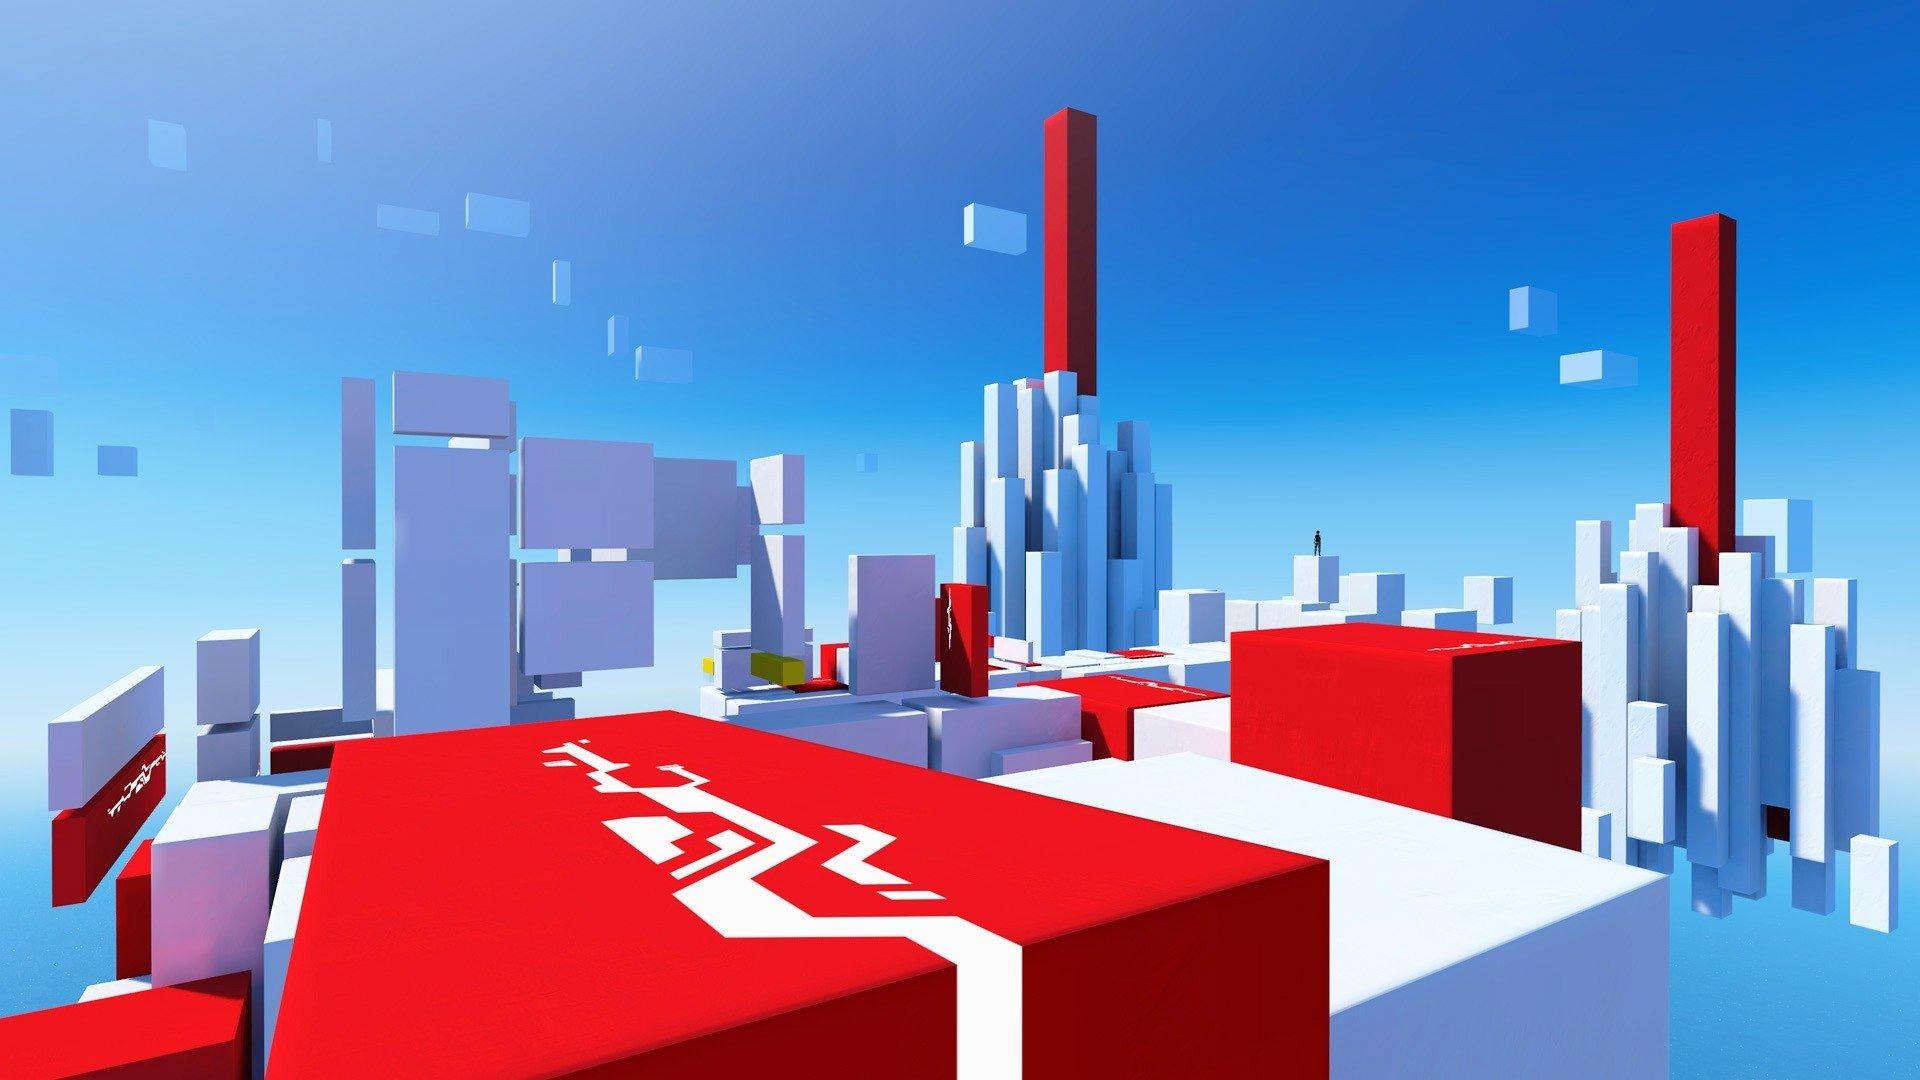 Video Game - Mirror's Edge  Wallpaper